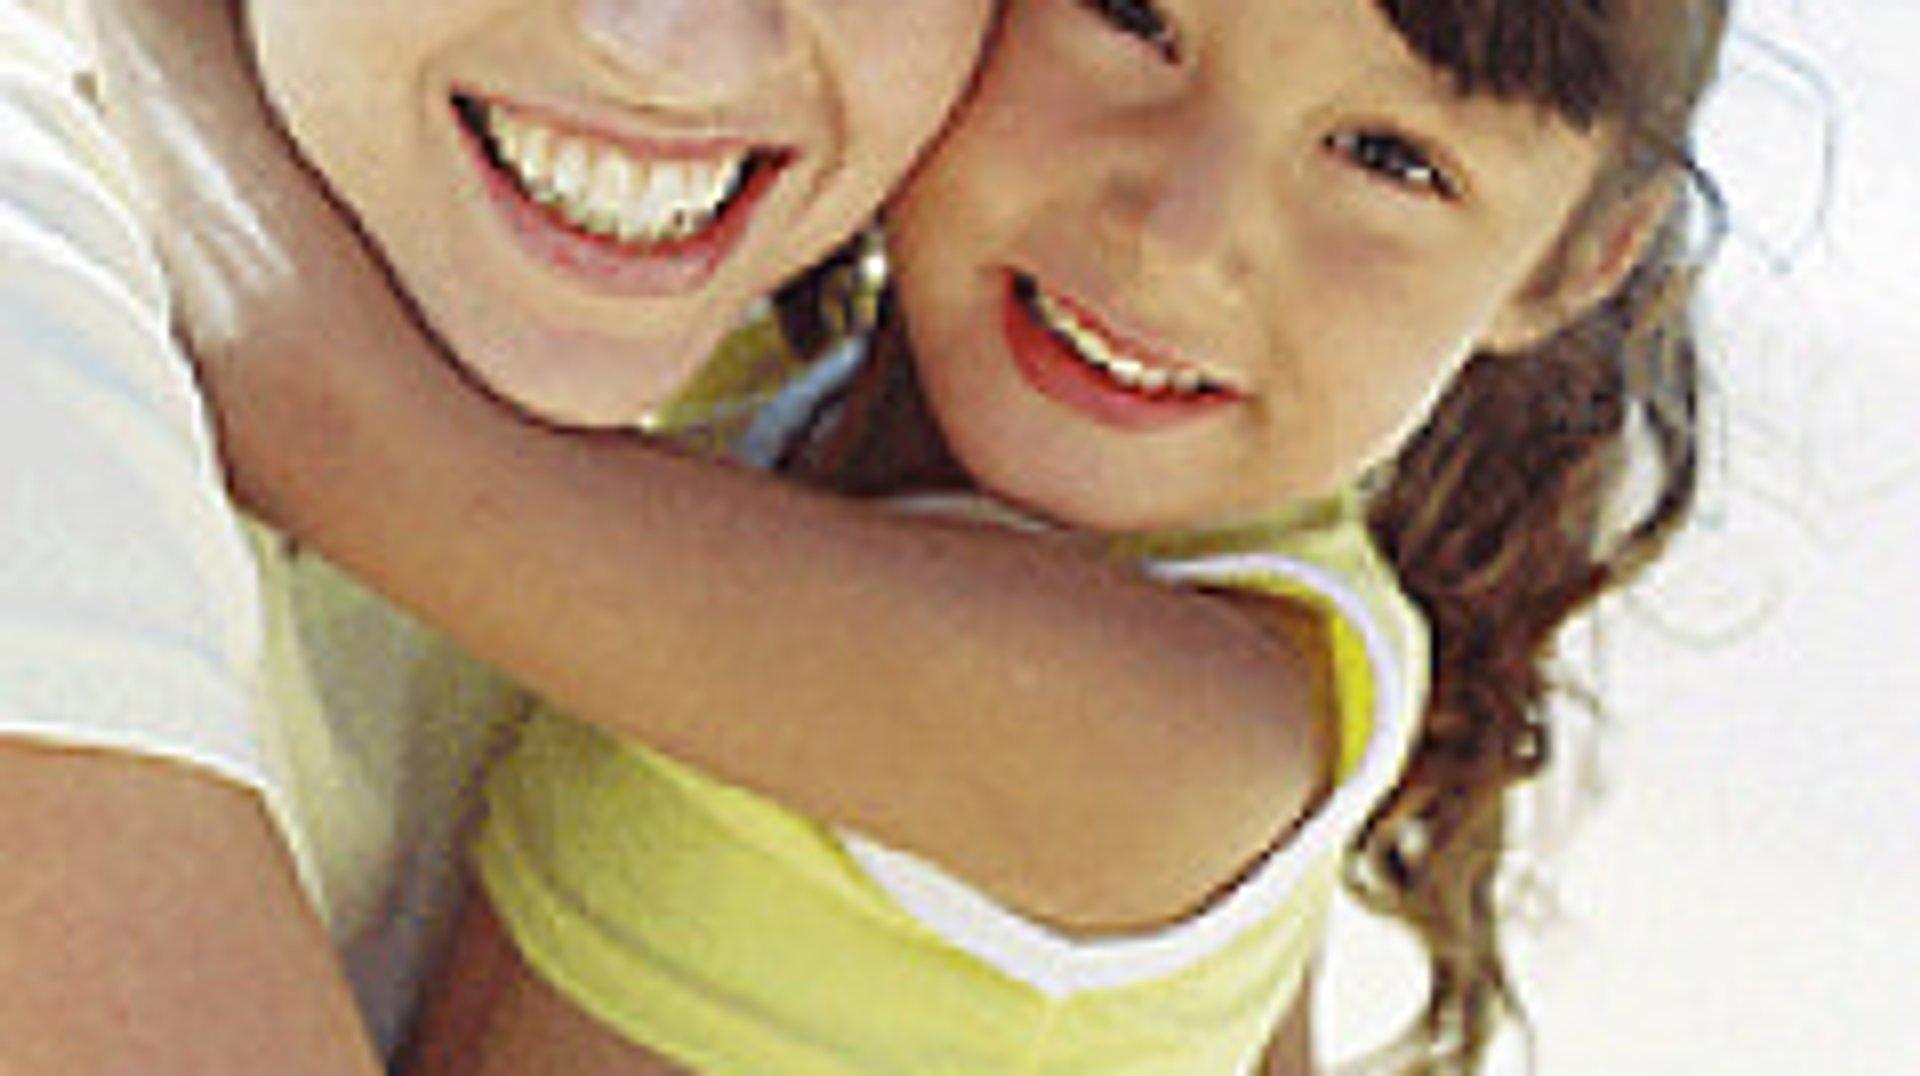 Bekommen muttermale wann kinder Kinder bekommen: